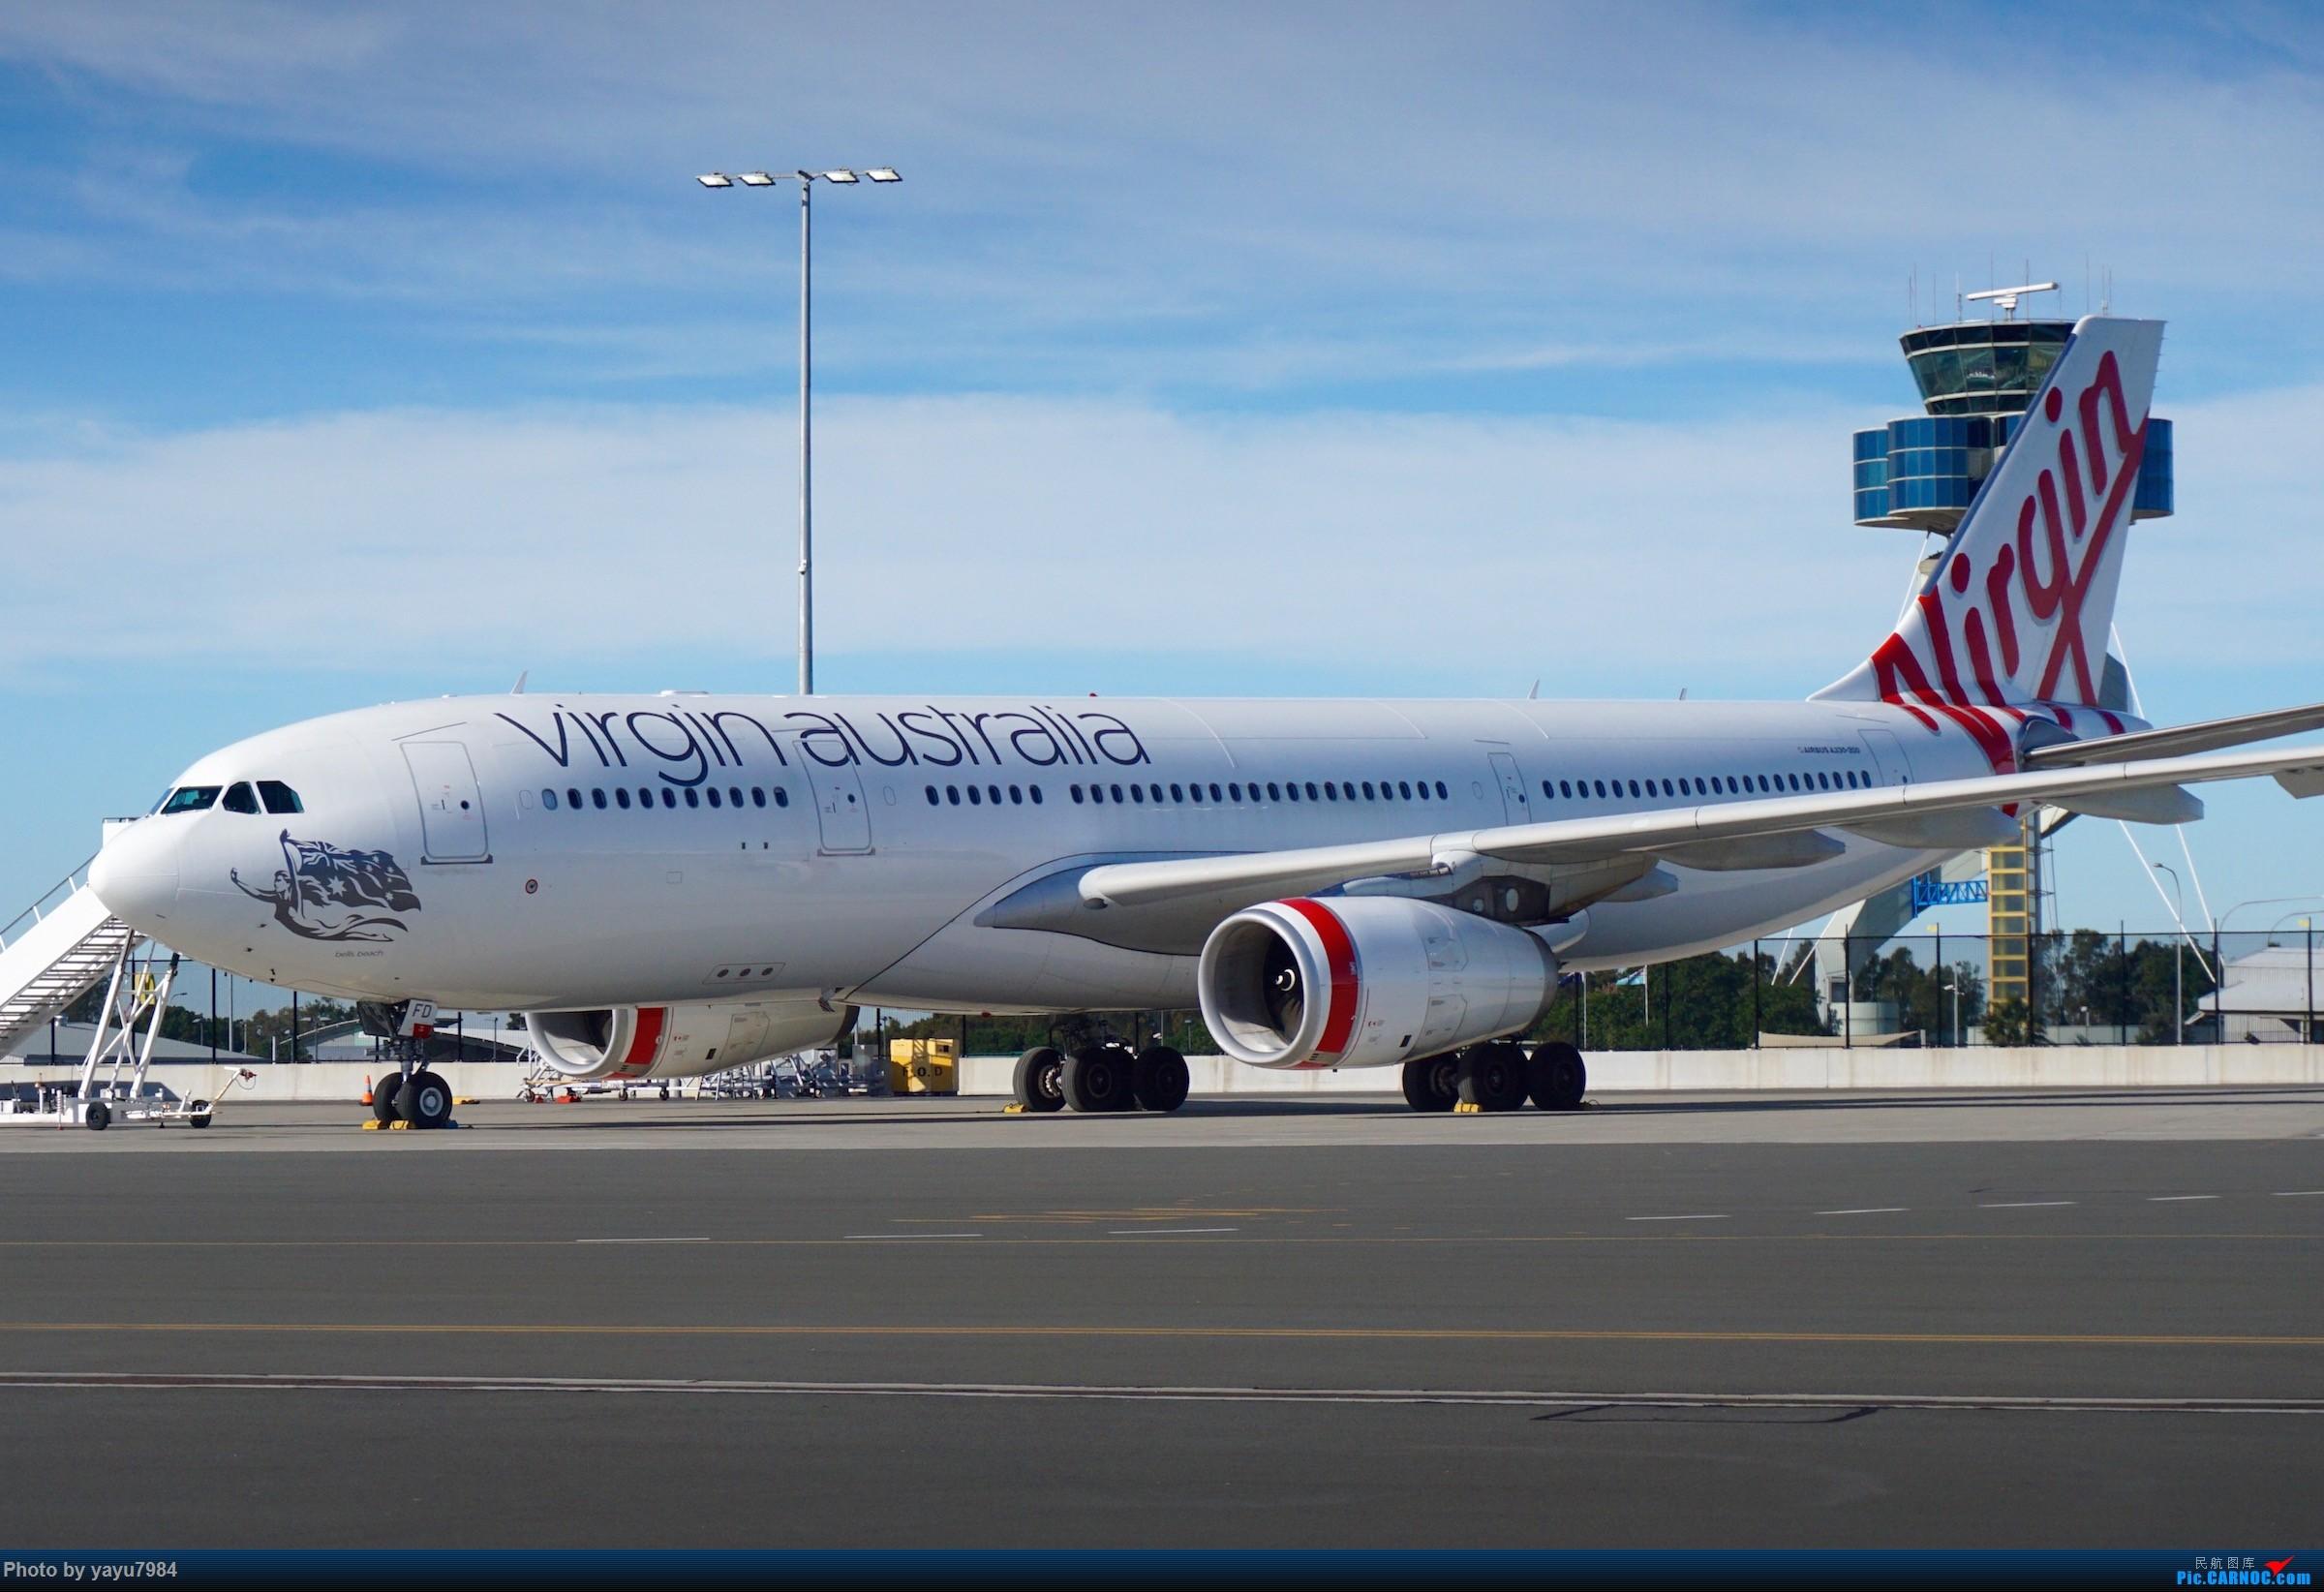 Re:[原创][SYD] 晨悉尼,Blu Emu停车场里拍34L起飞以及滑行 AIRBUS A330-200 VH-XFD 澳大利亚悉尼金斯福德·史密斯机场